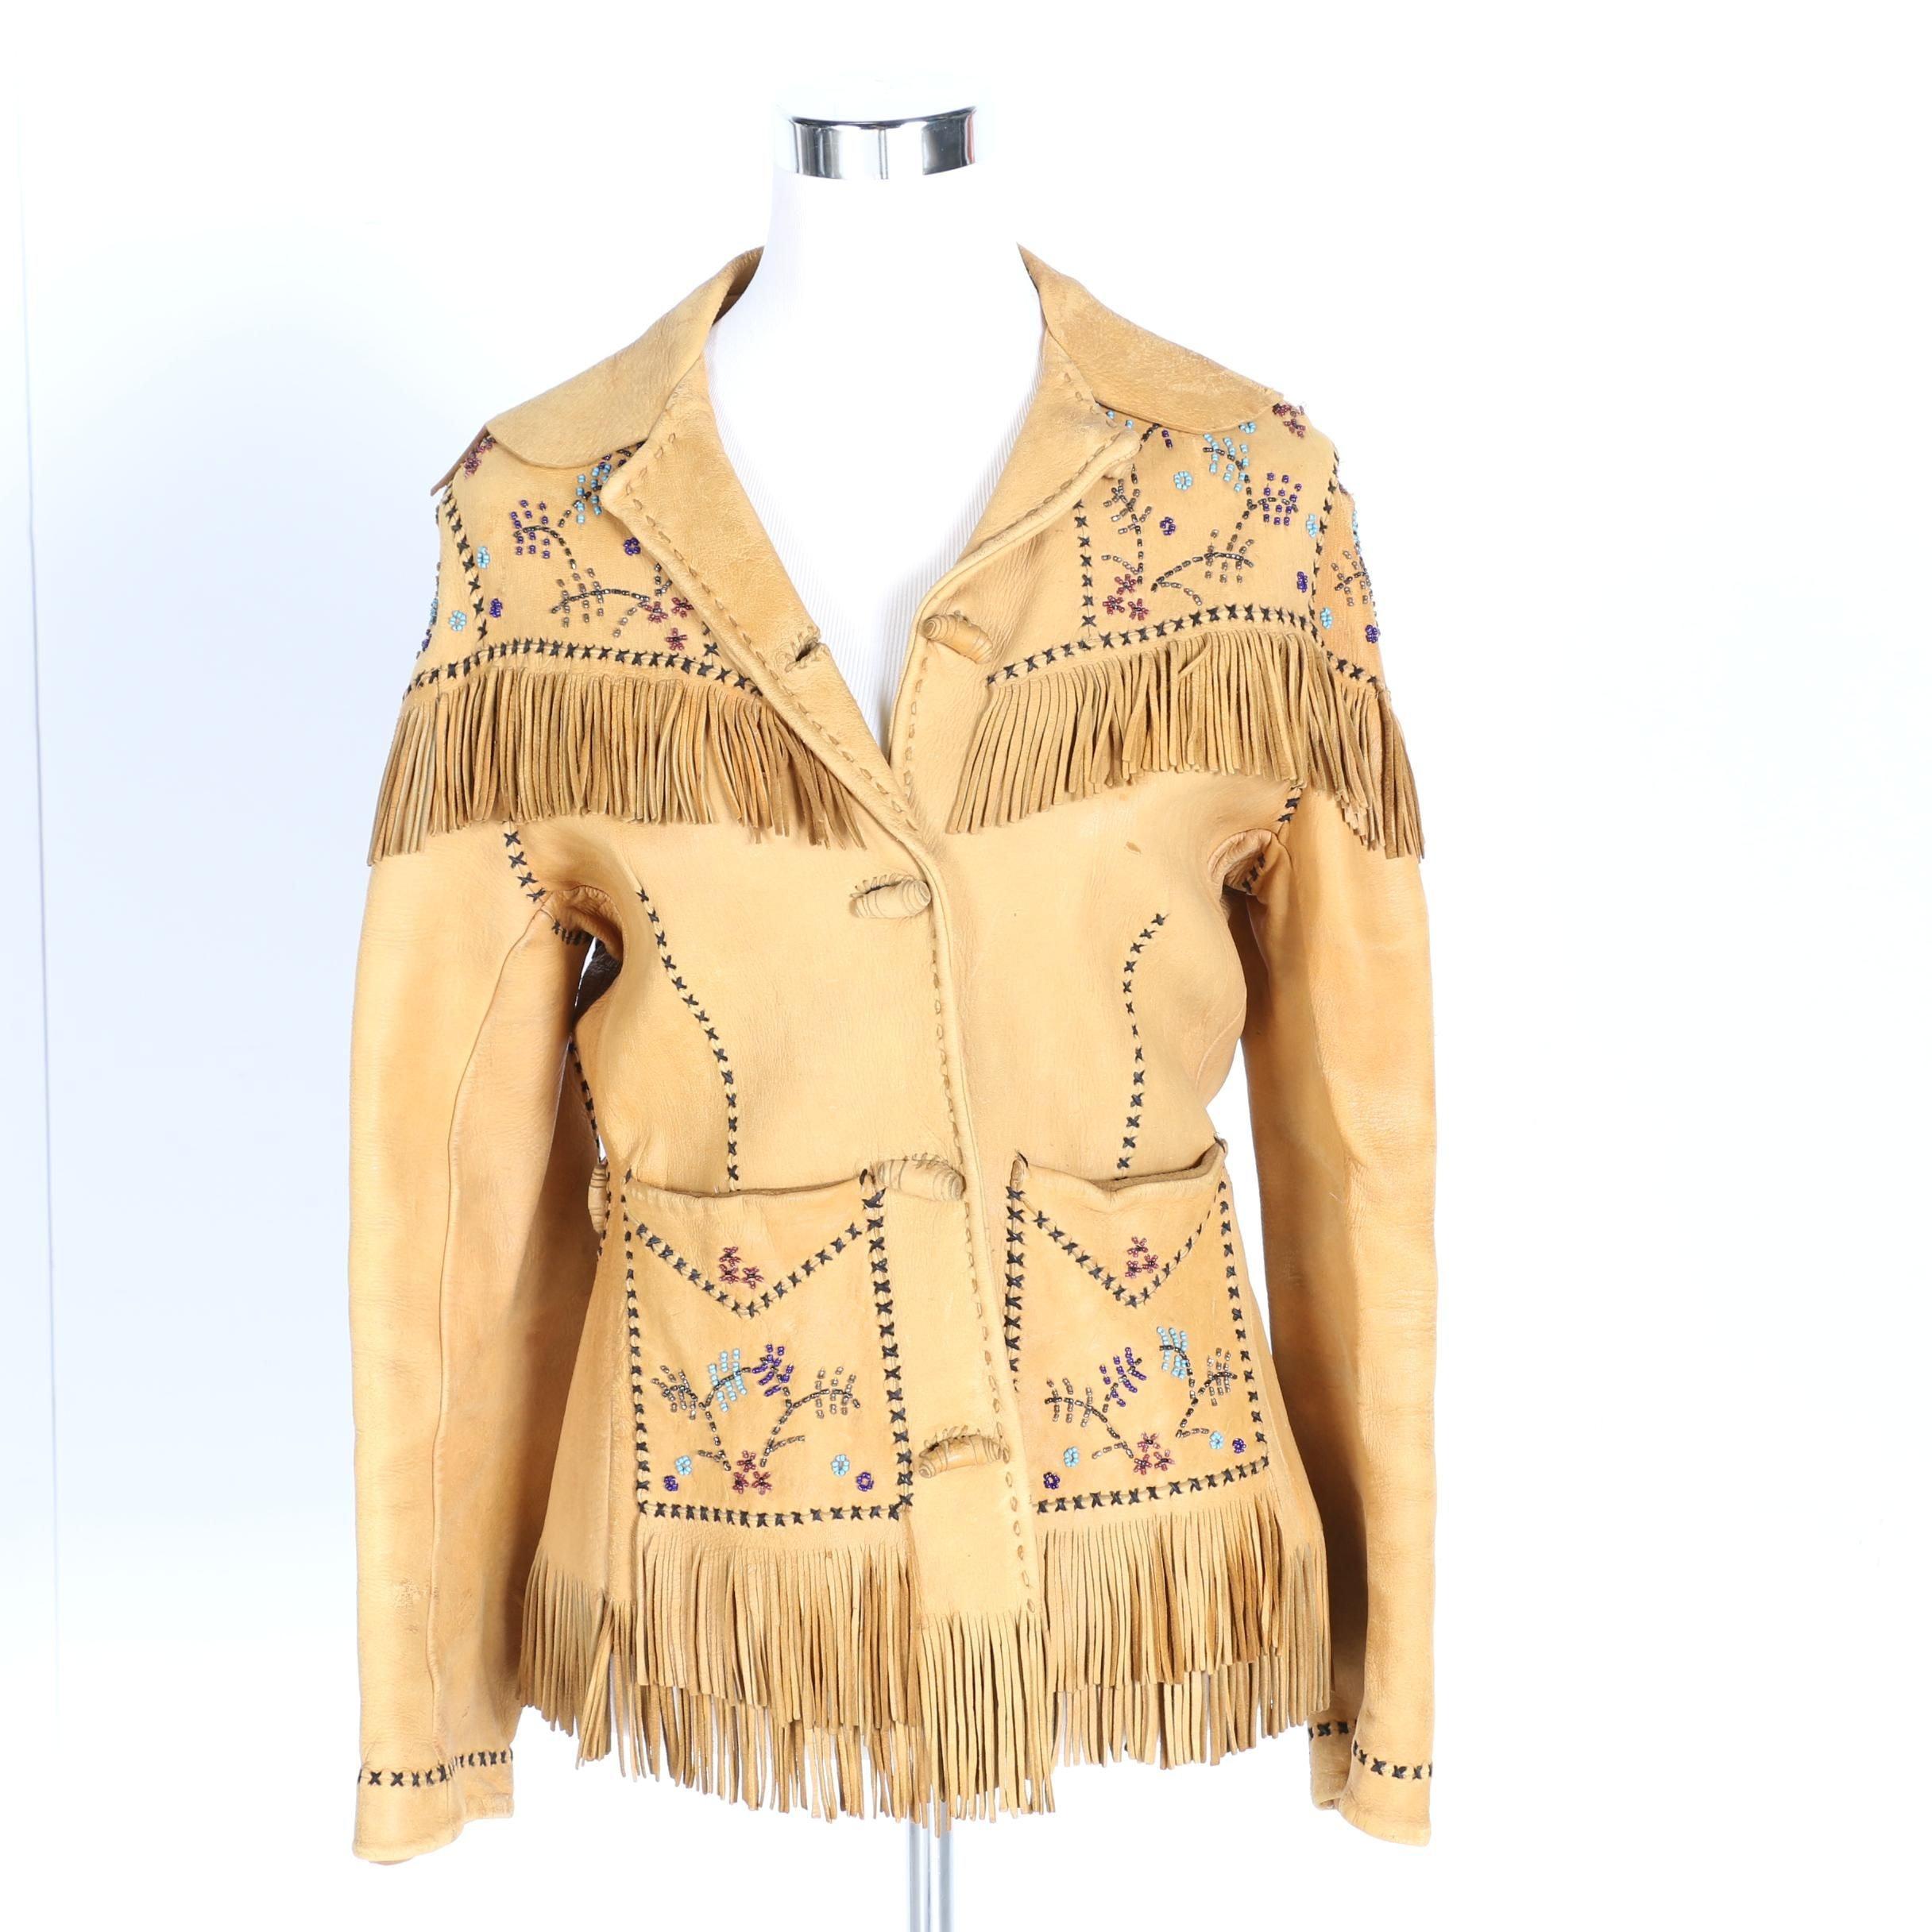 Nezperce Native American Inspired Women's Jacket